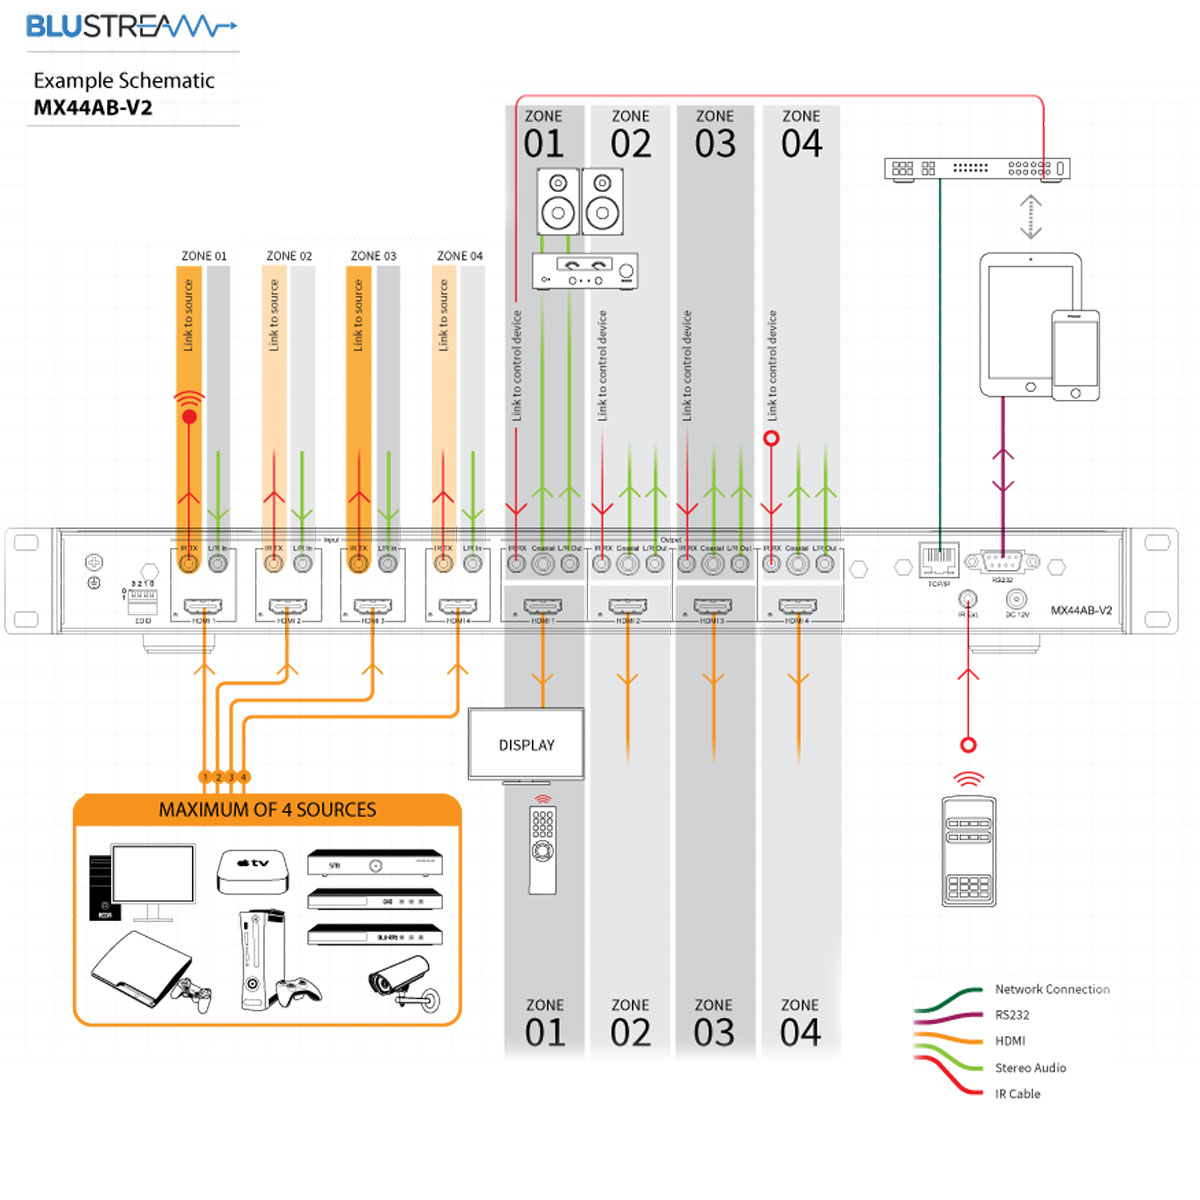 Blustream Mx44ab V2 4x4 4k Hdmi Matrix With Audio Breakout And Edid Wiring Diagram